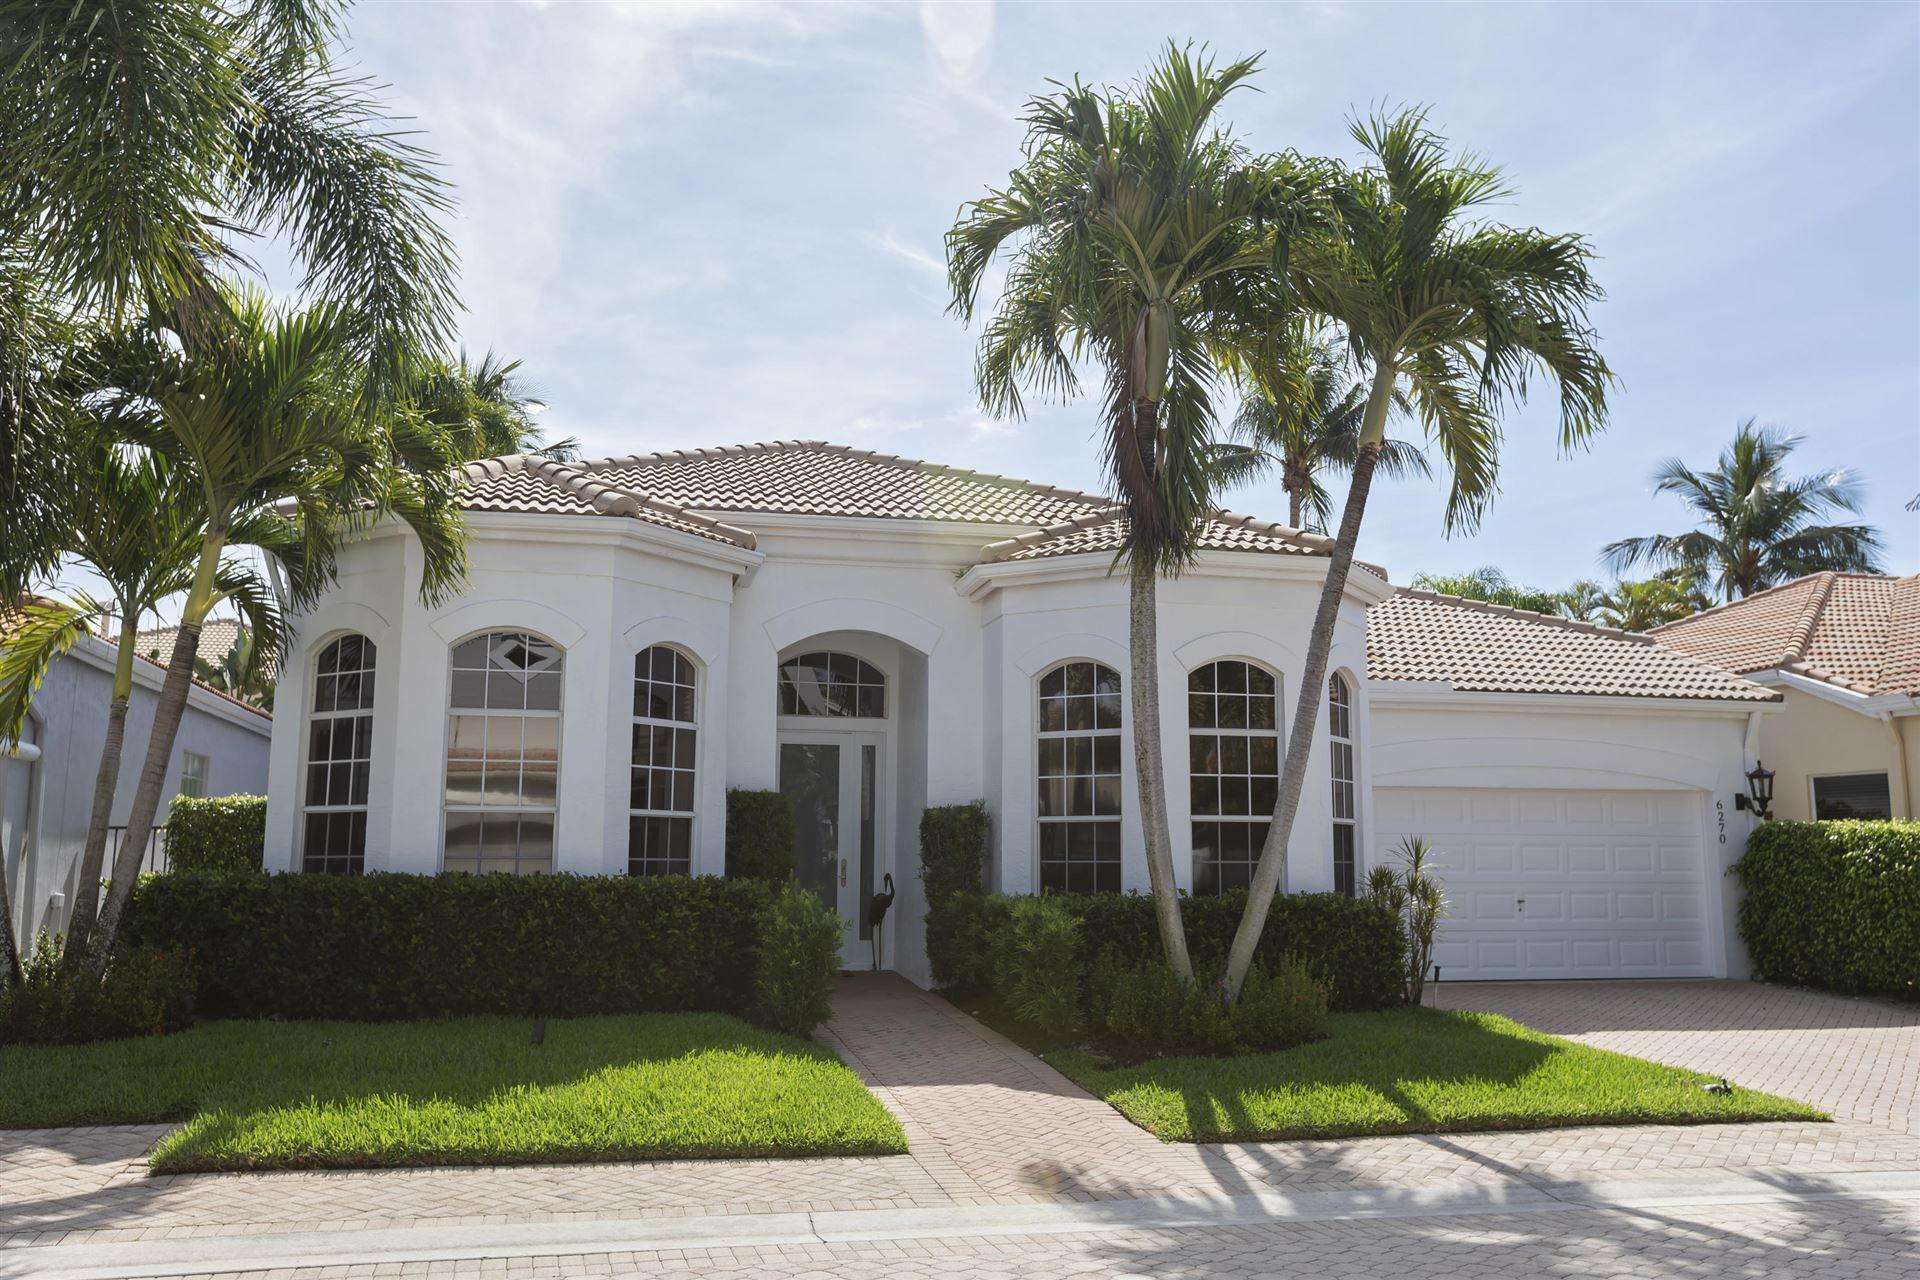 6270 NW 43rd Terrace, Boca Raton, FL 33496 - #: RX-10617419